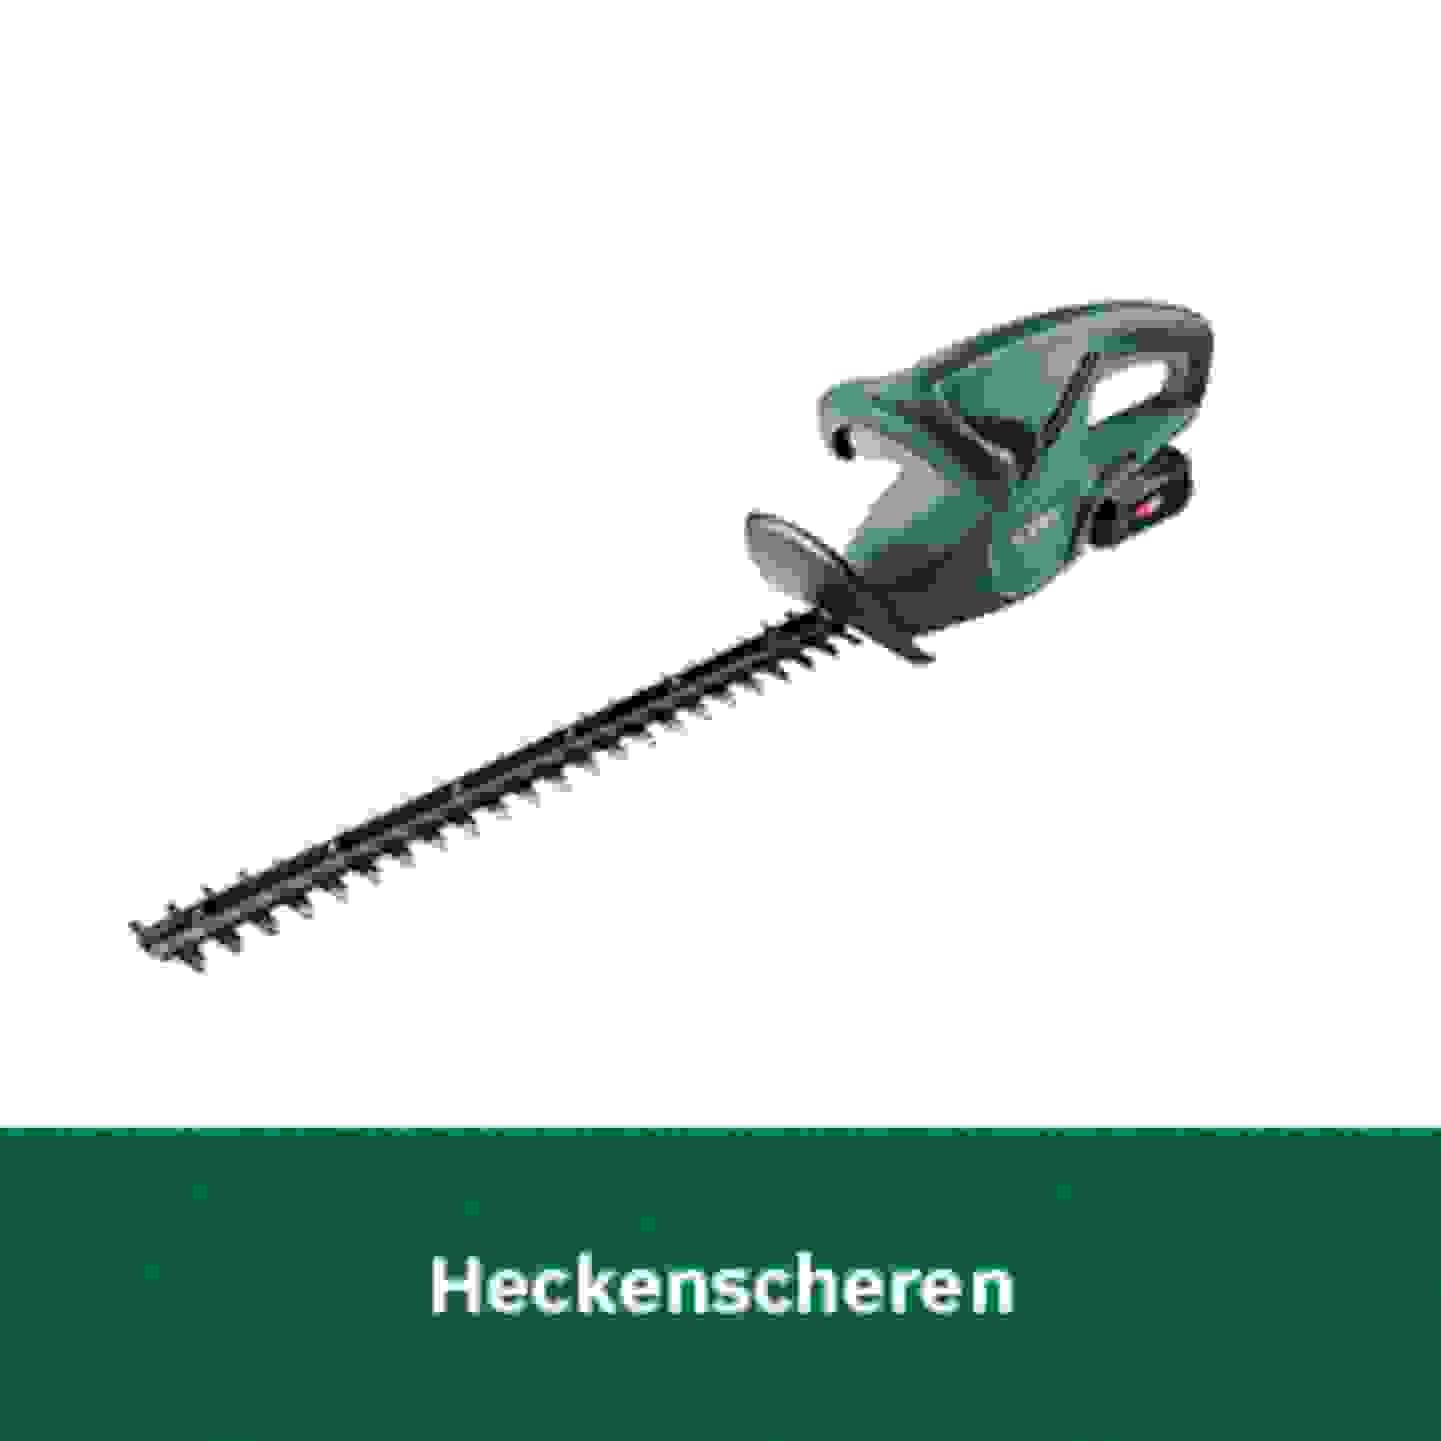 Bosch Heckenscheren